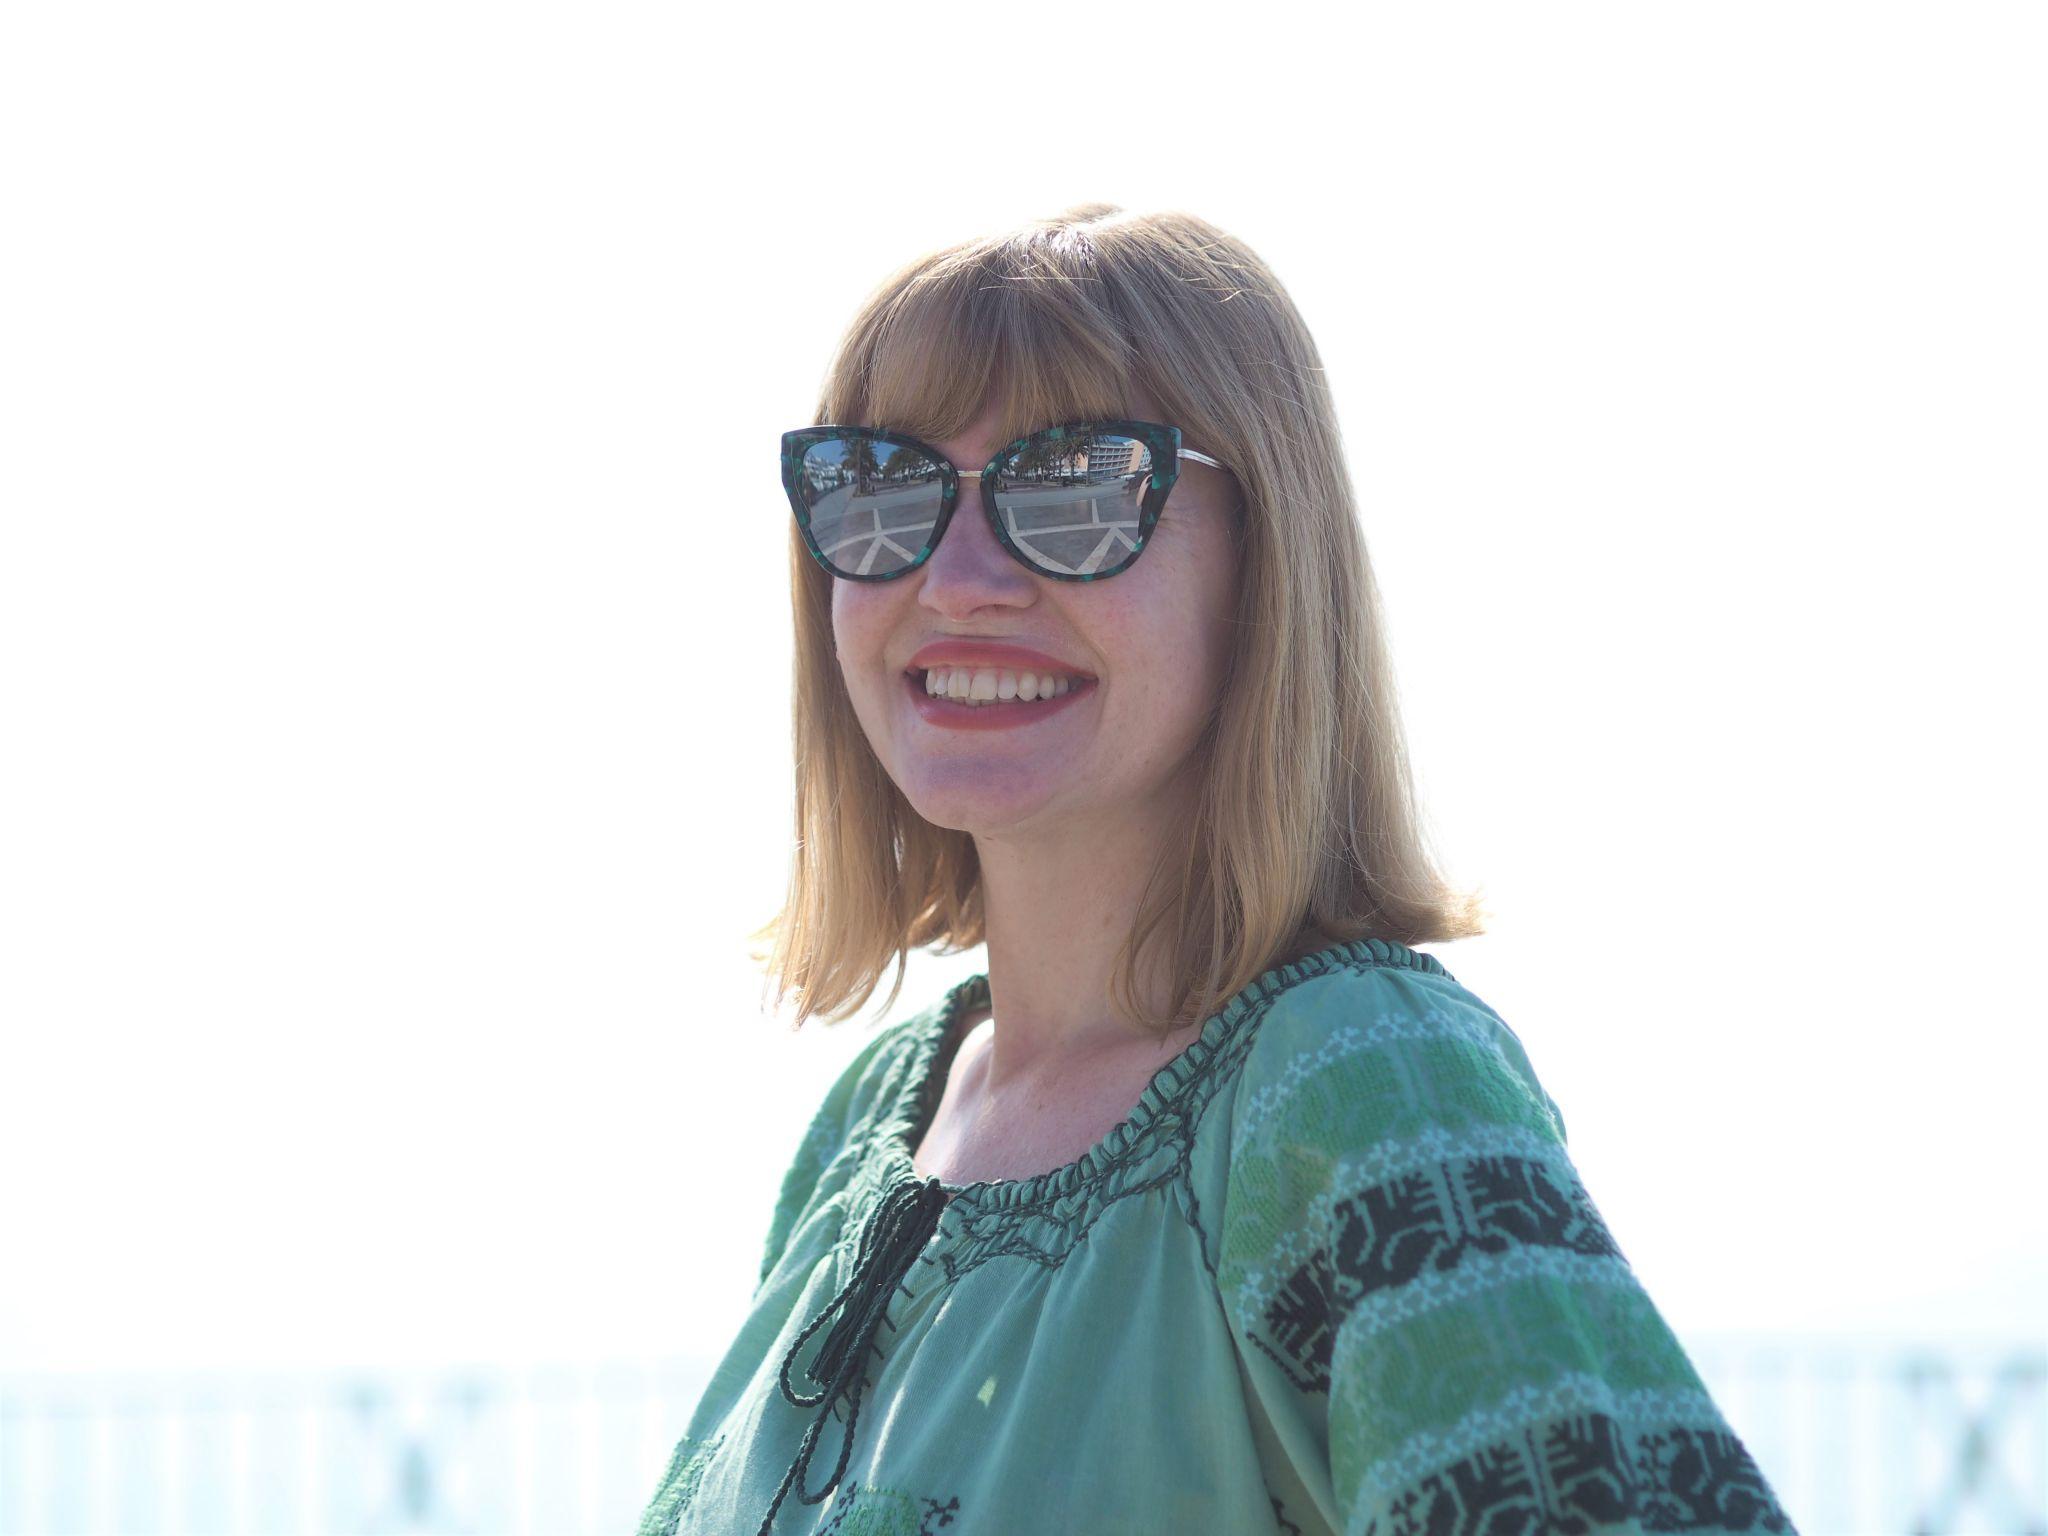 greem embroidered beach dress and green cat eye sunglasses